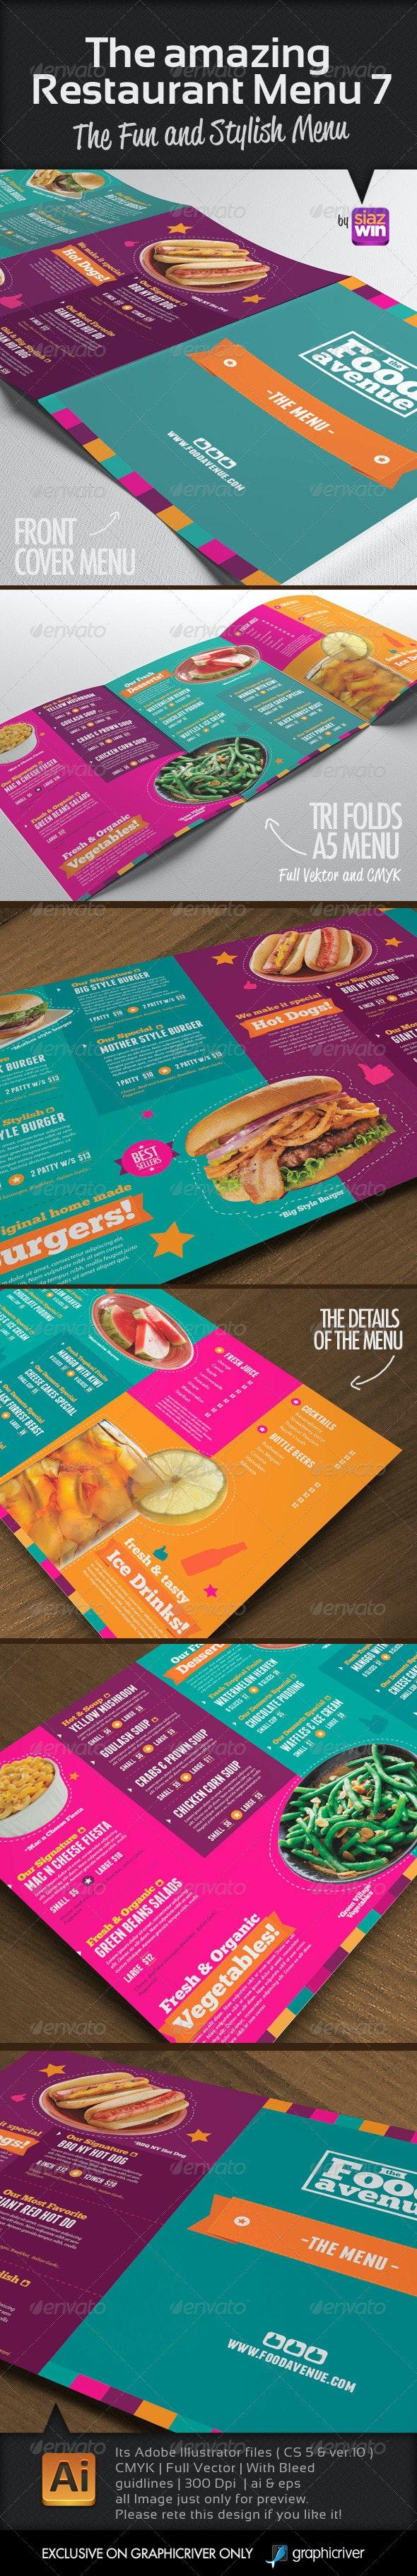 The Restaurant Menu 7 - Food Menus Print Templates